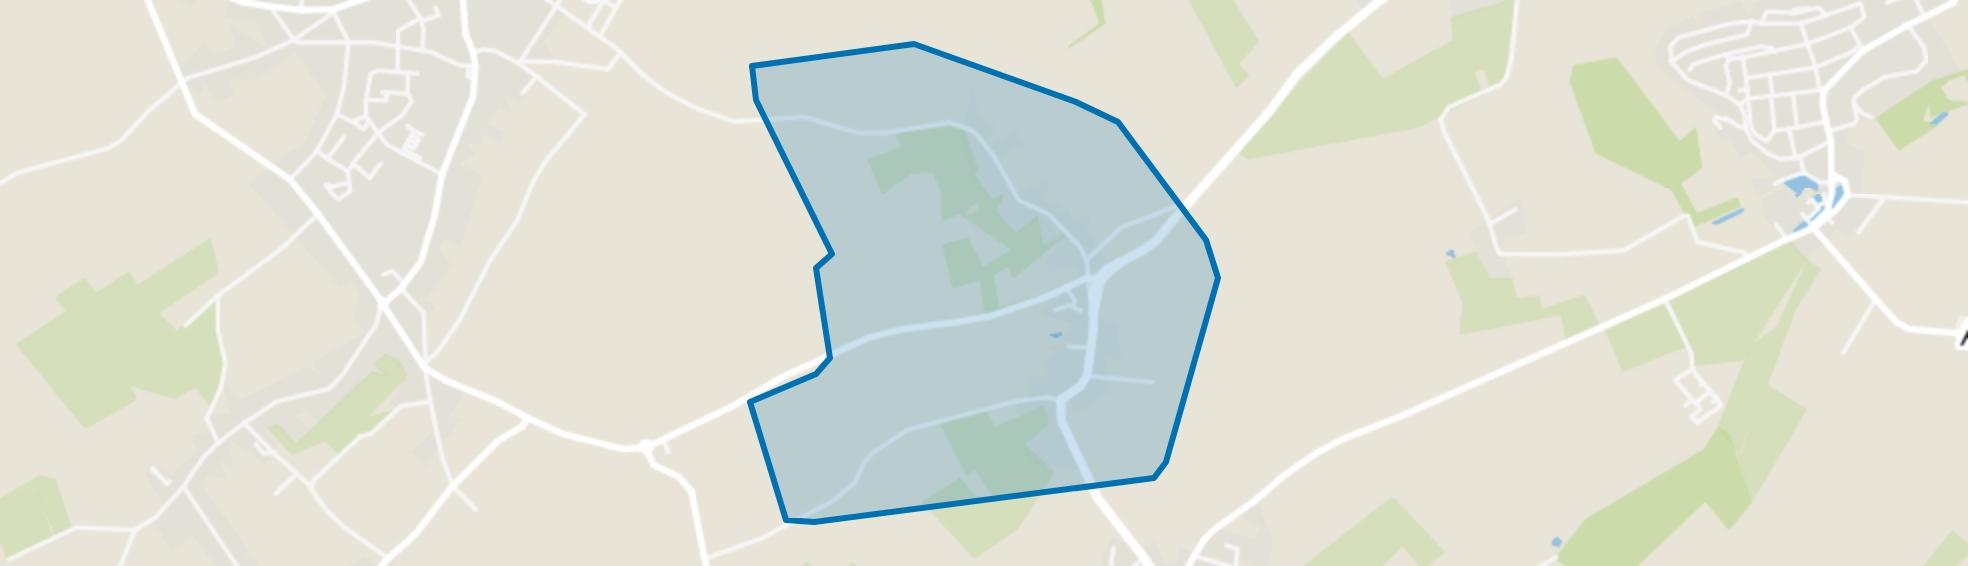 Aalbeek, Hulsberg map